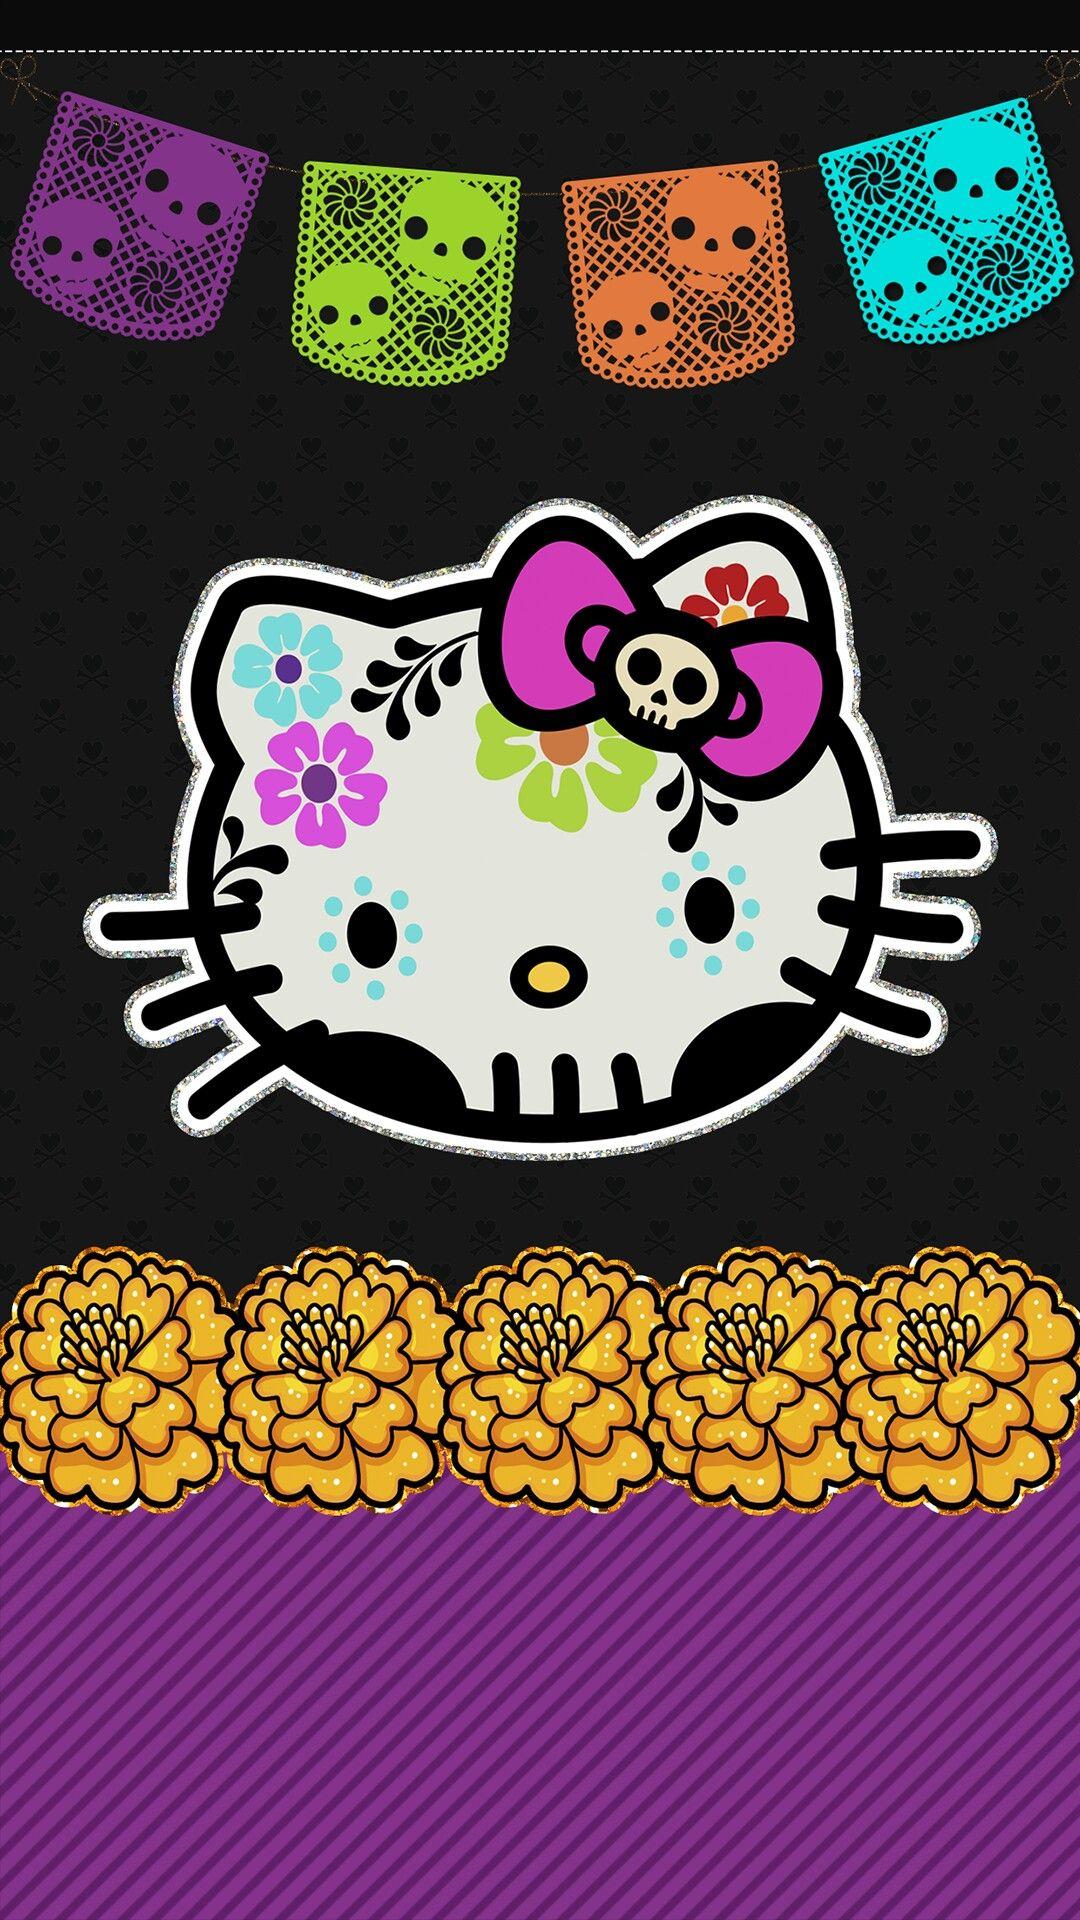 hello kitty cell phone wallpaper, lock screen pic, dia de los